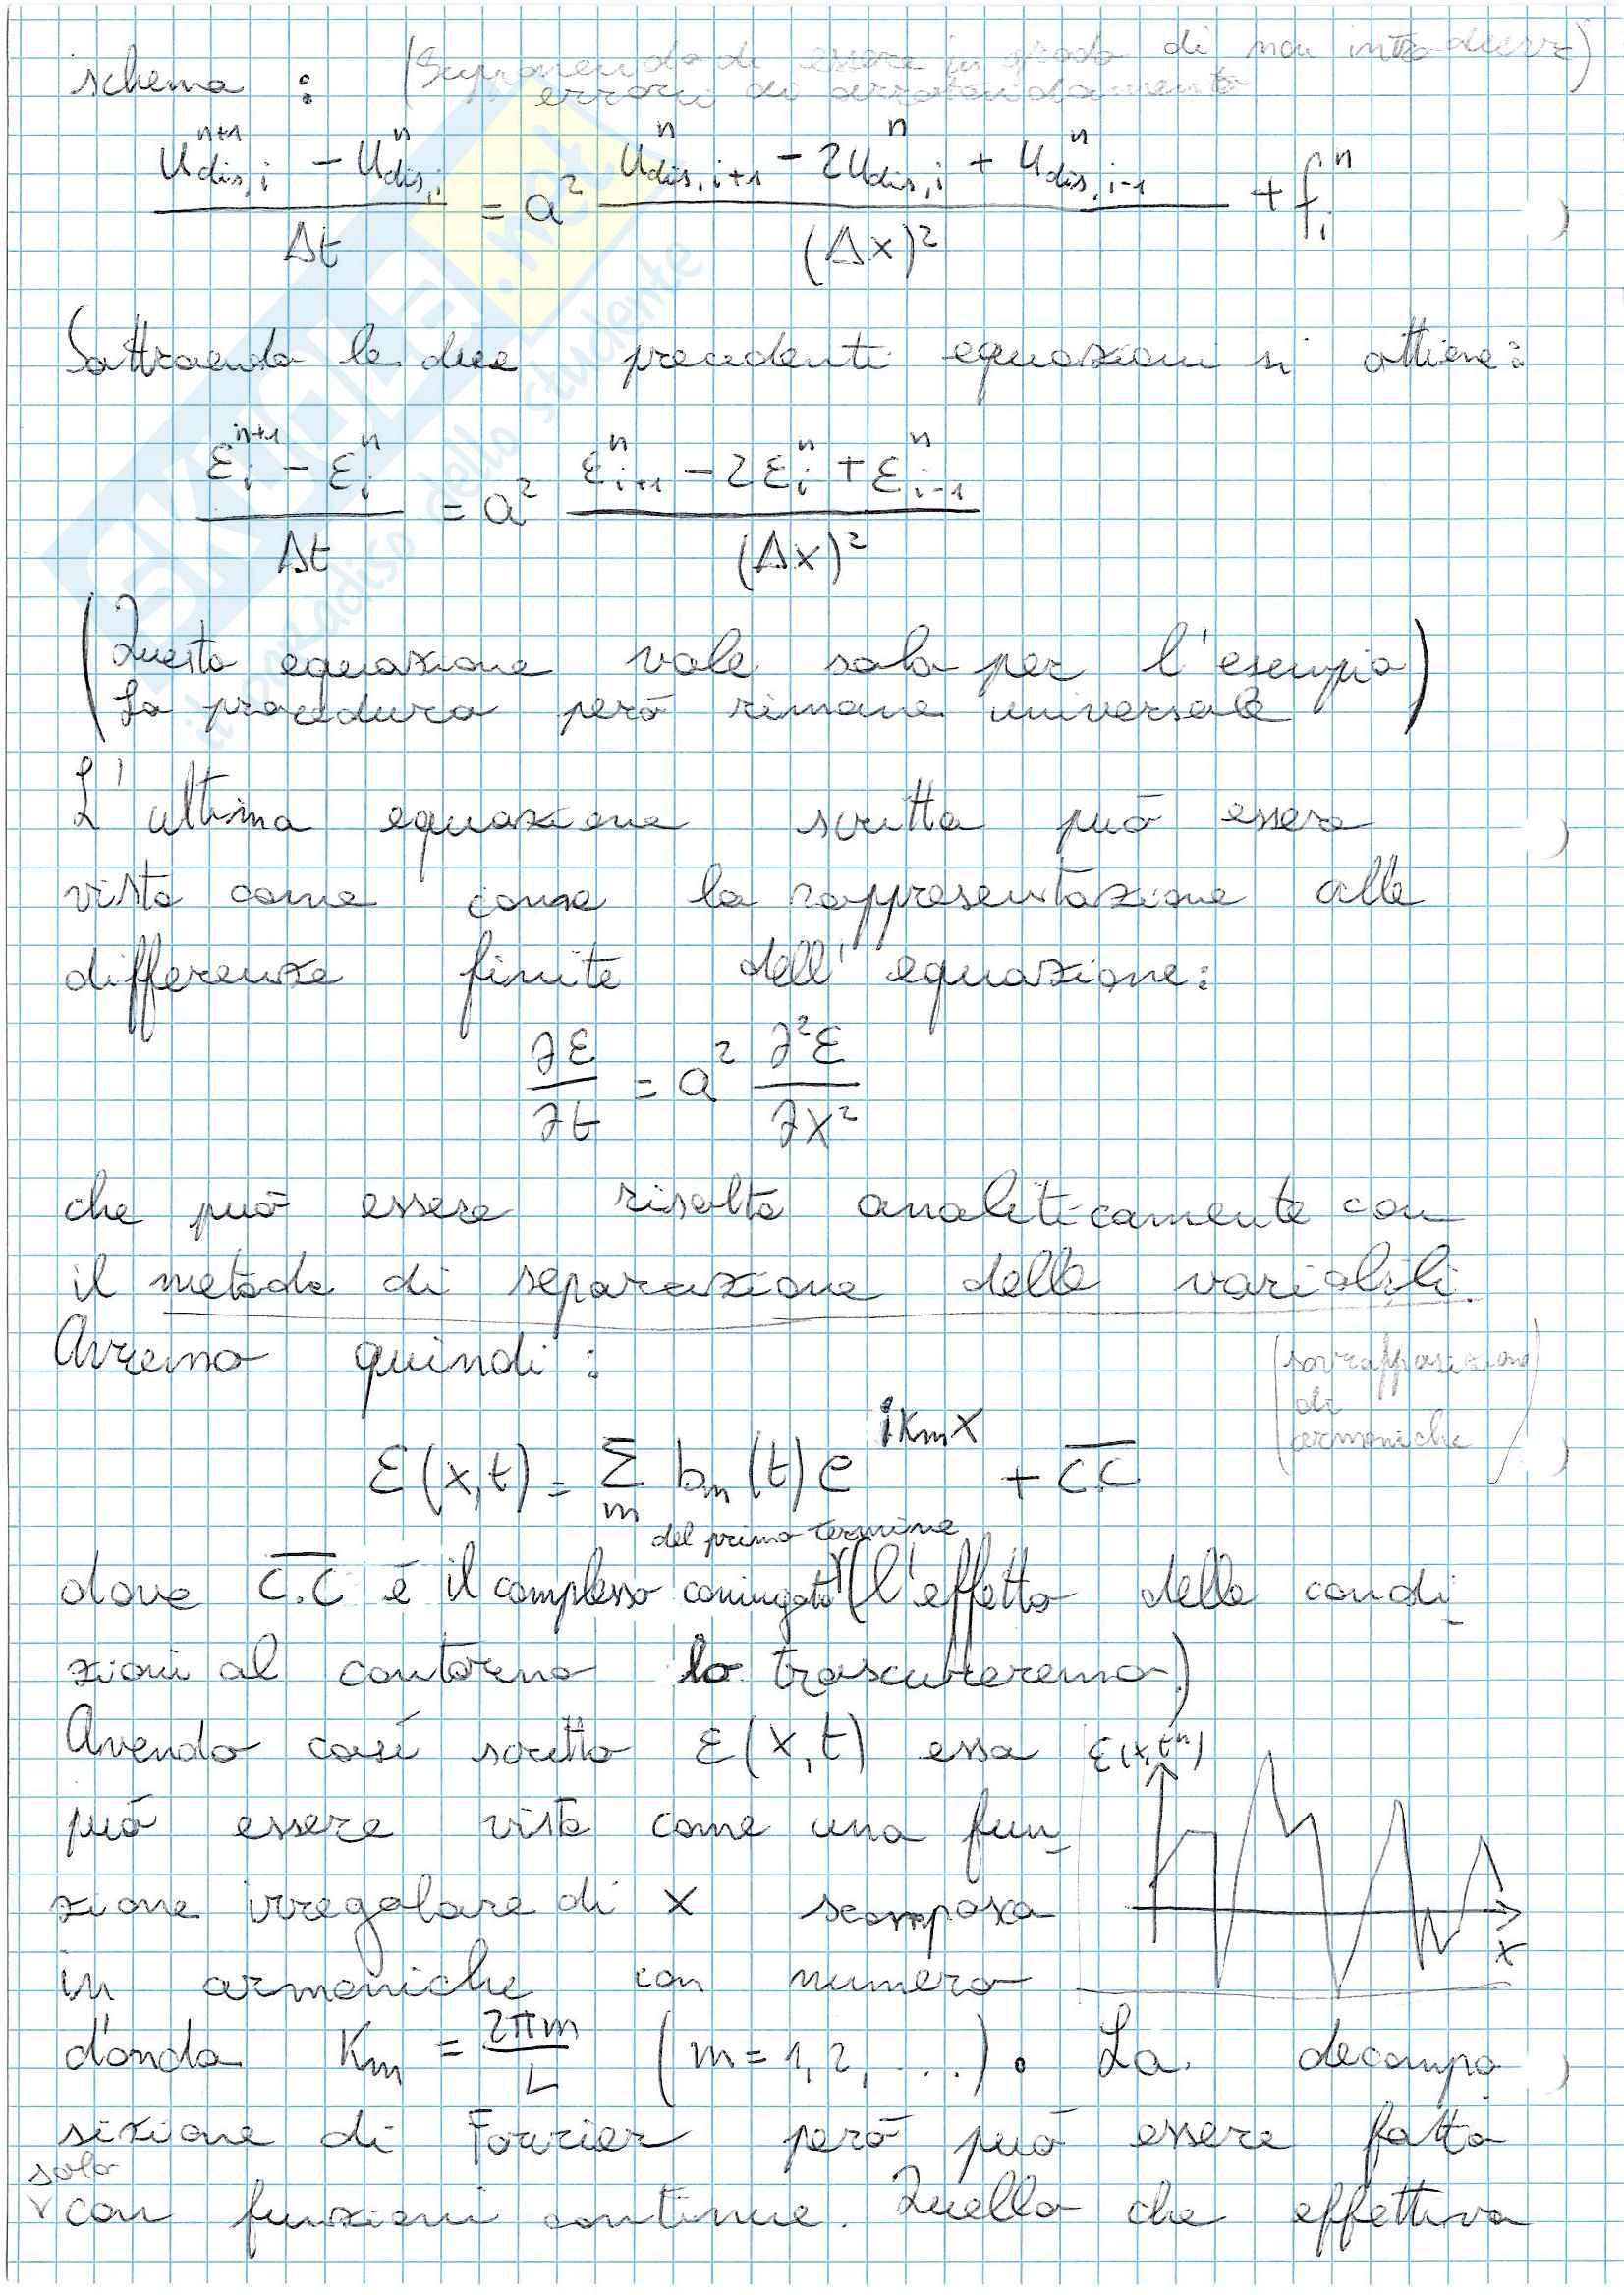 Appunti Fluidodinamica computazionale Pag. 26